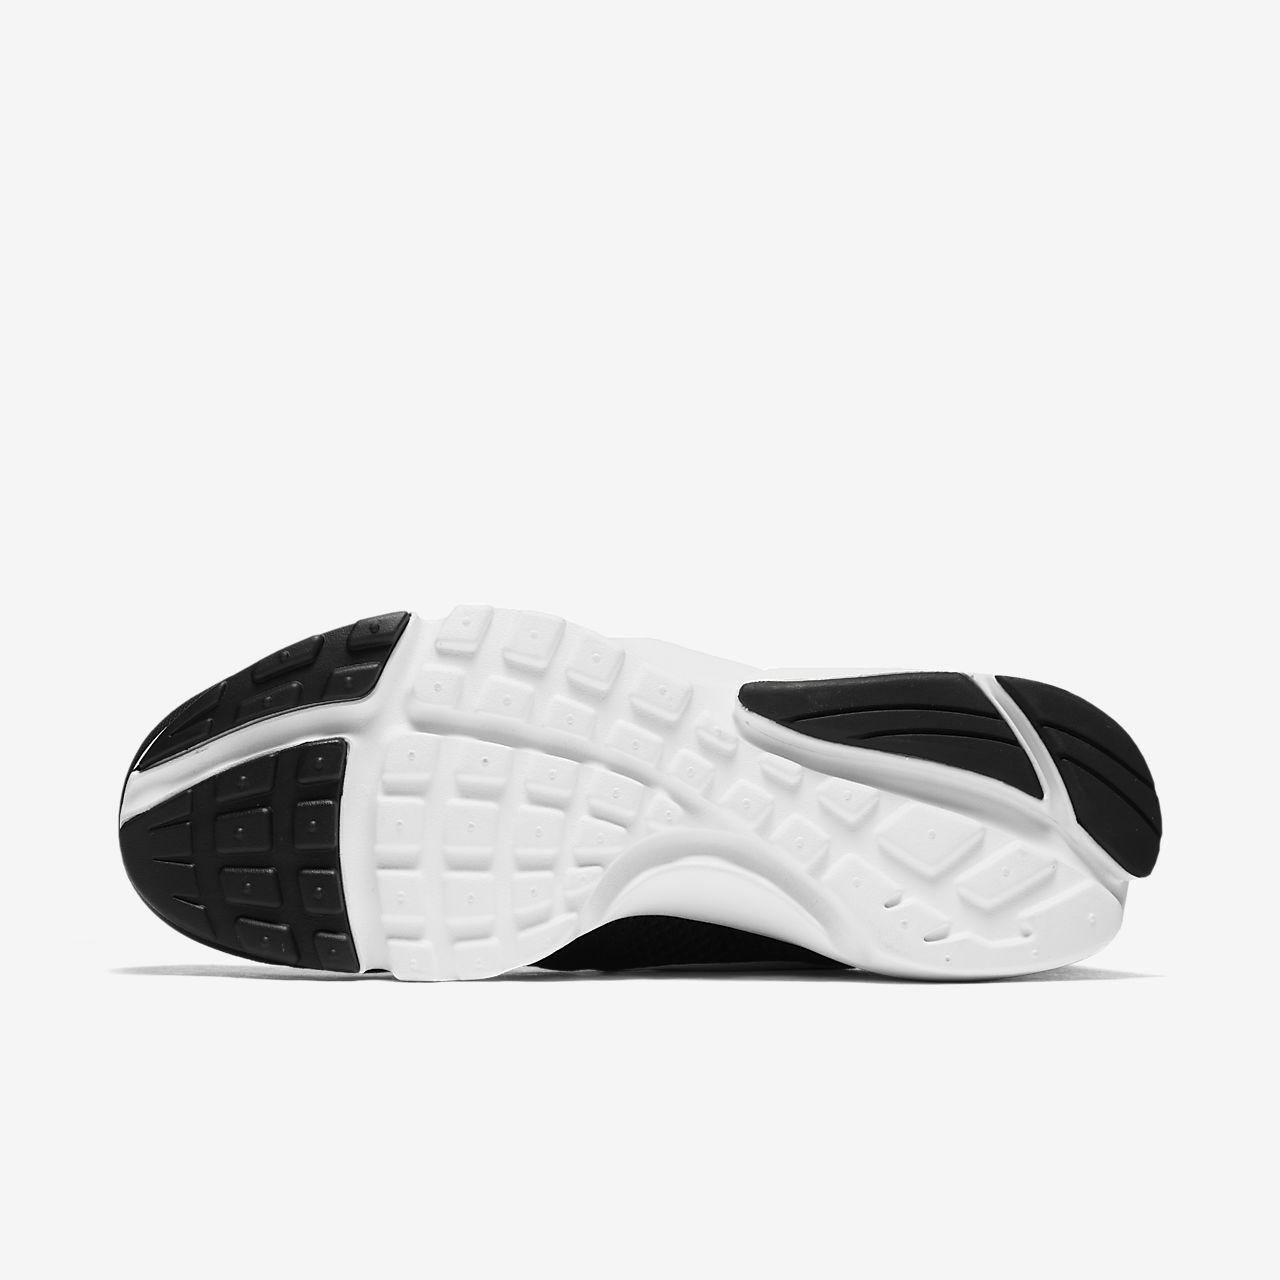 fad6b015e63 Calzado para mujer Nike Presto Fly. Nike.com MX